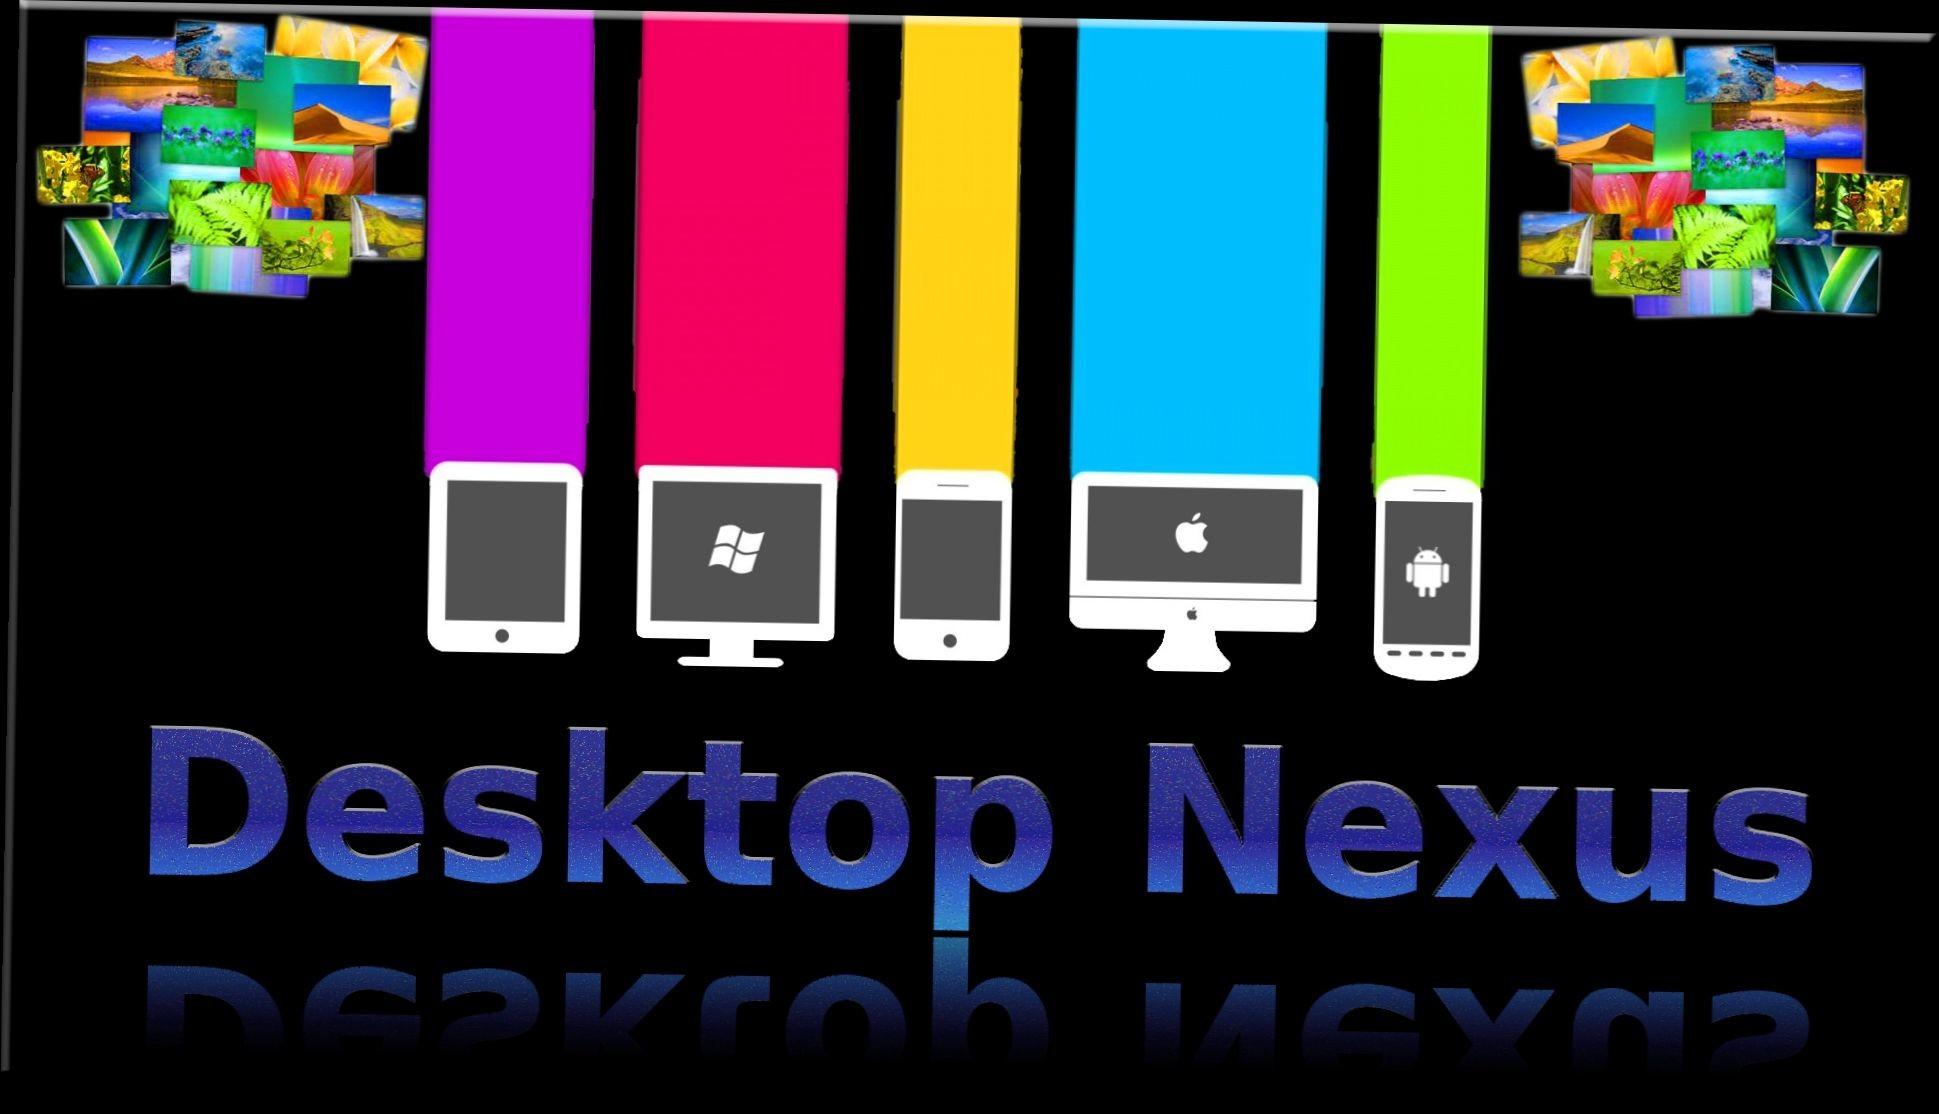 nexus free desktop wallpaper – 5 items